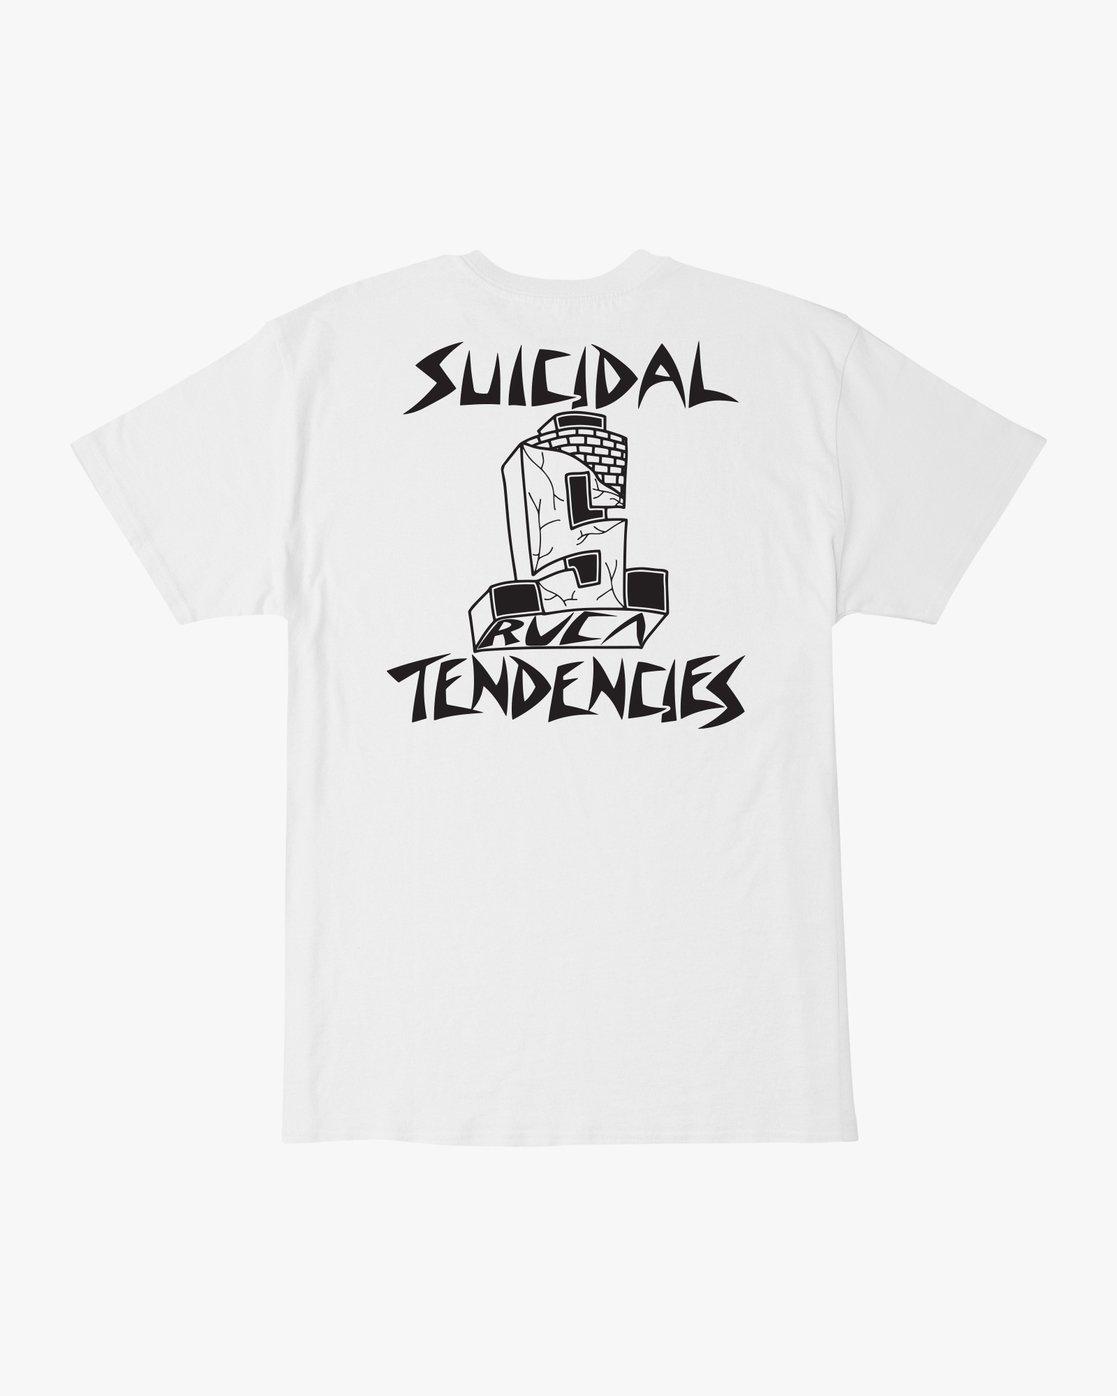 0 RVCA x Suicidal Tendencies T-Shirt White M419TRSU RVCA